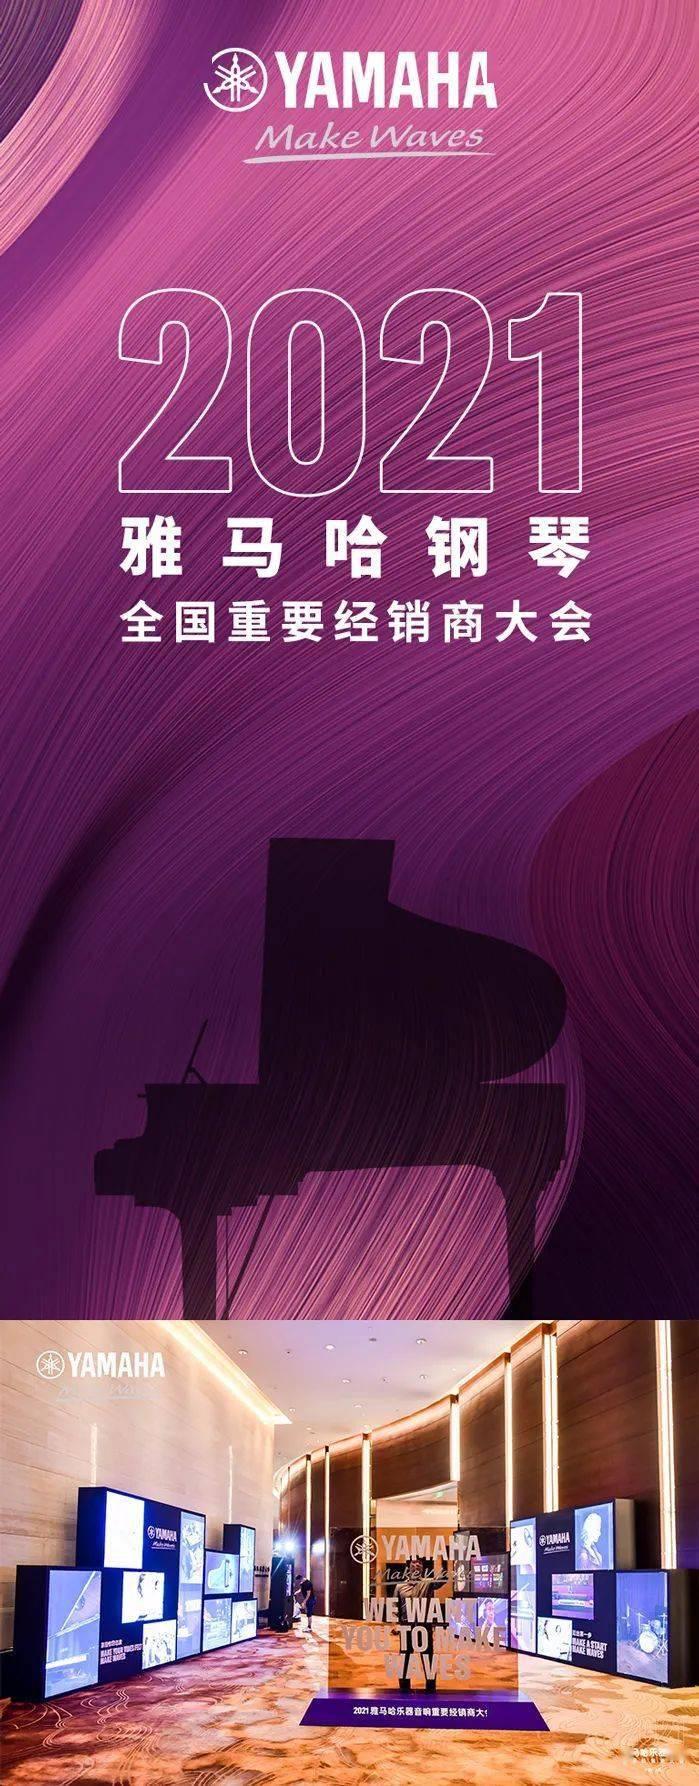 2021 Yamaha 雅马哈钢琴全国重要经销商大会圆满落幕!